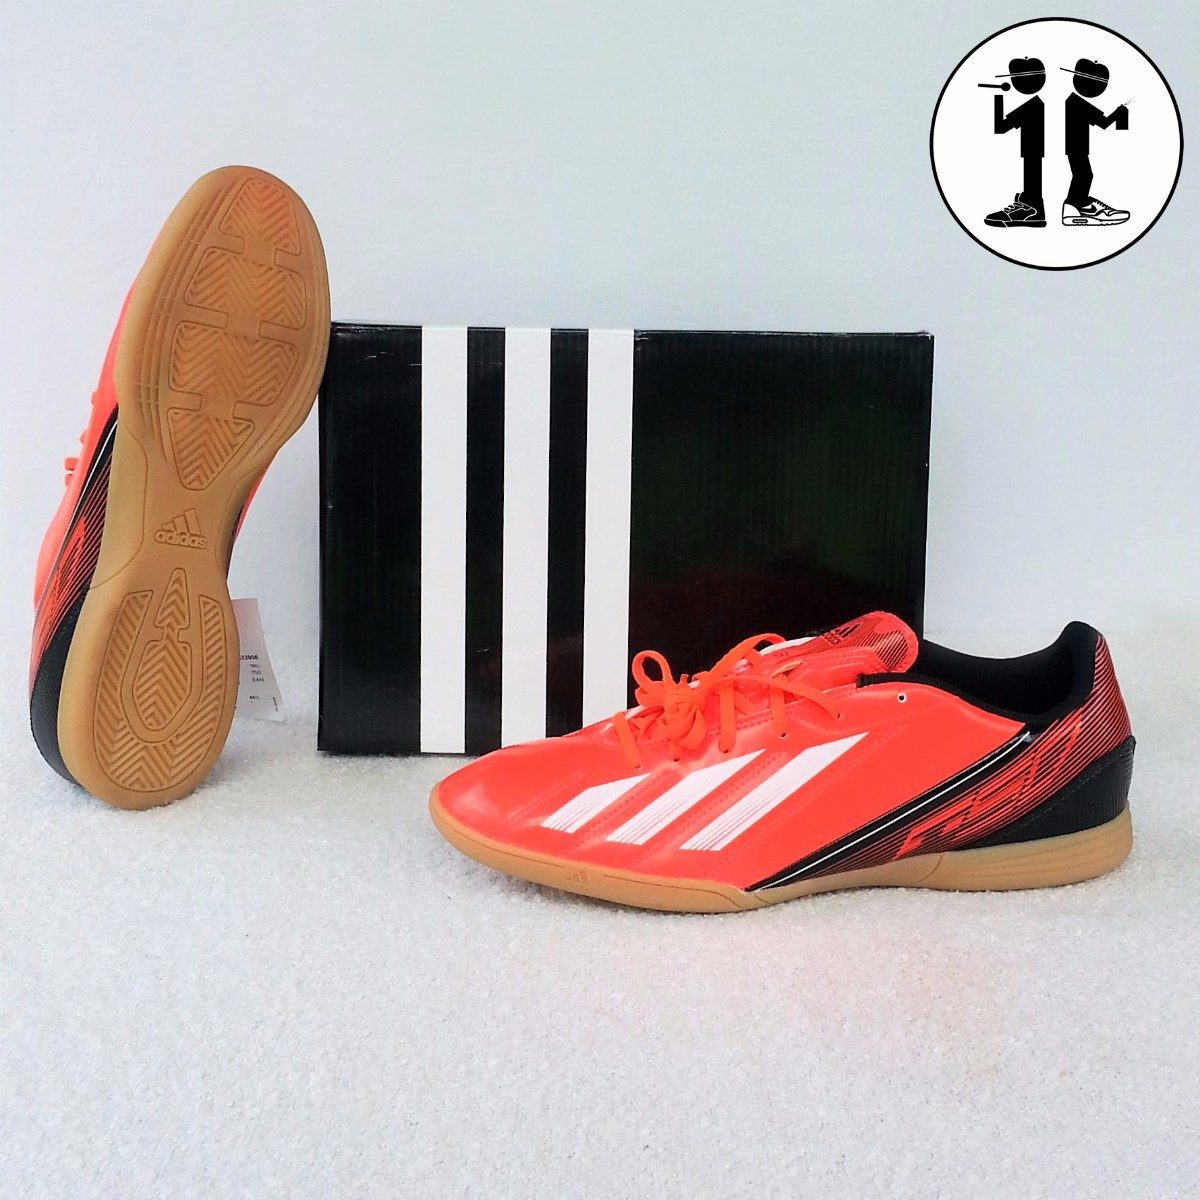 65 45 Adidas Originales 5 Zapatos X4ptyh7 Bs Hombre Futbol Sala F50 Talla 5Tx7wFI7vq